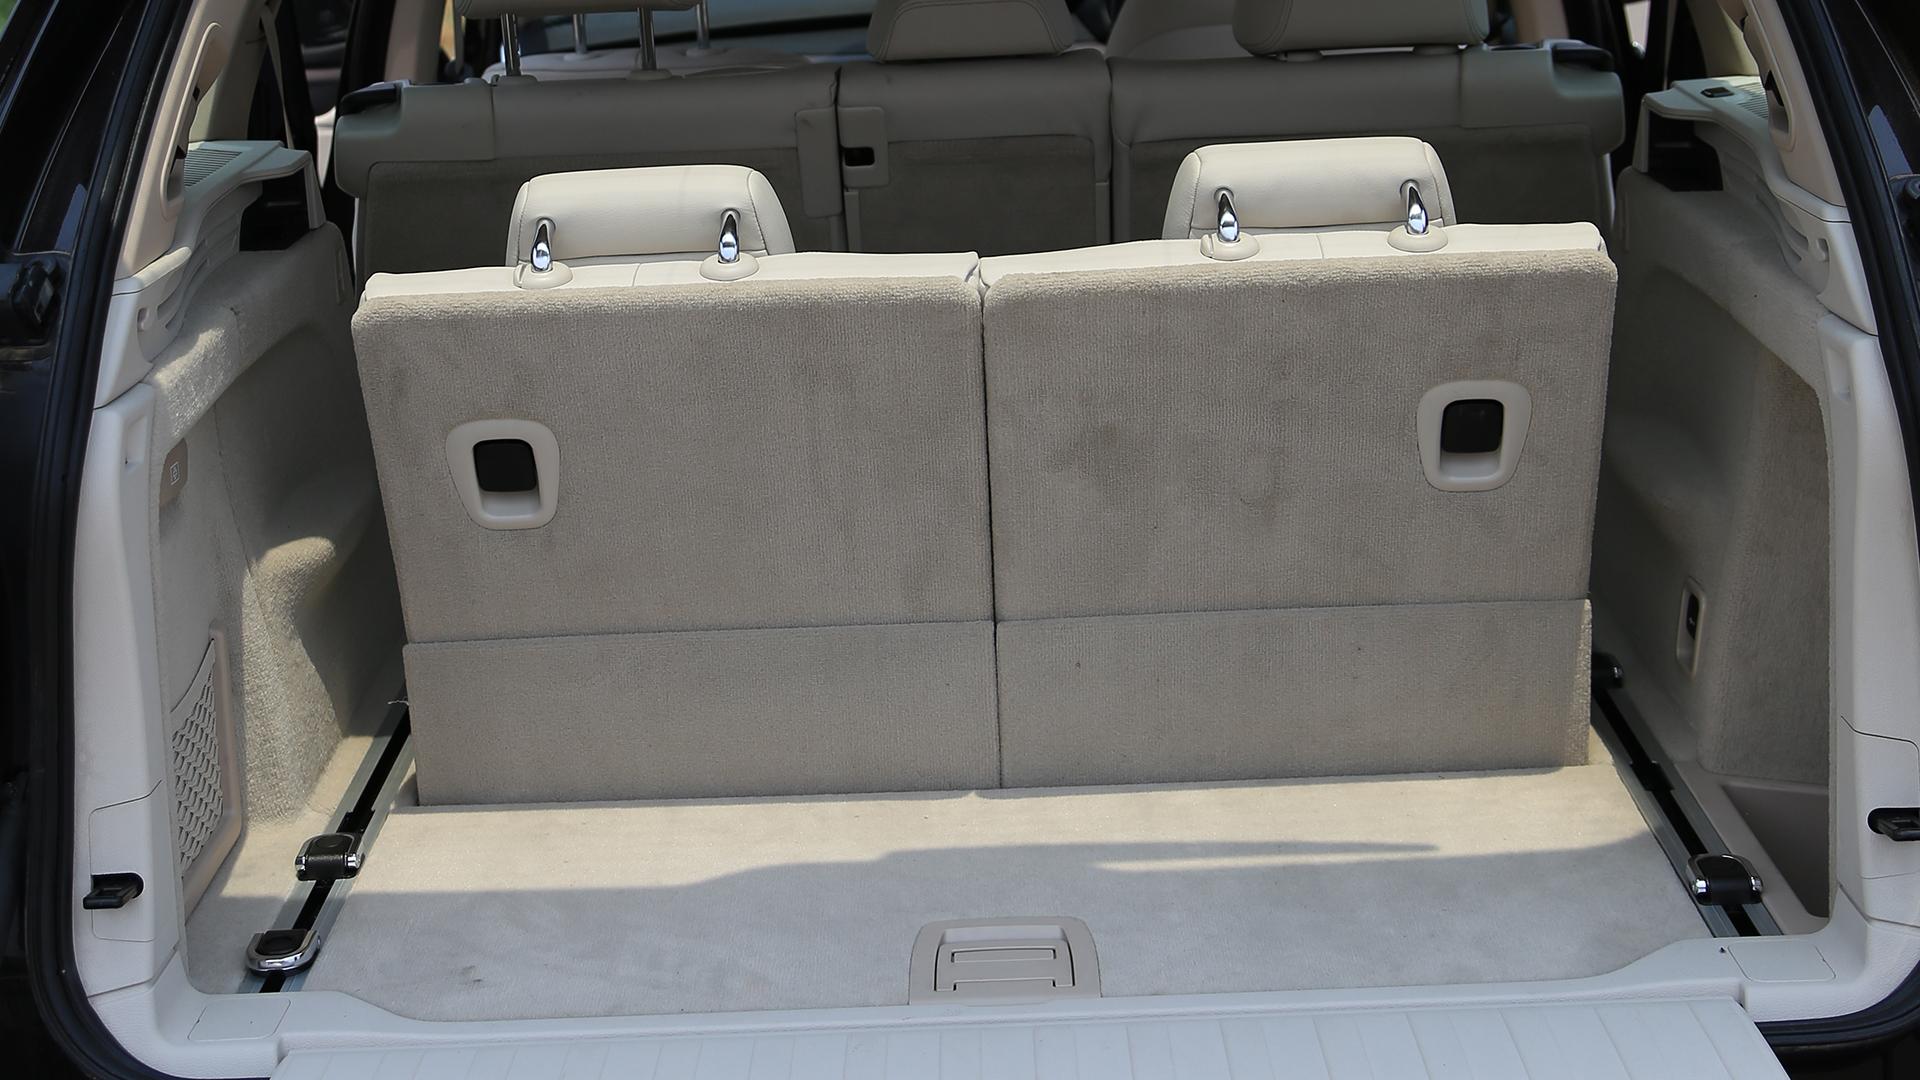 BMW-X5-2014-xDrive30d Interior